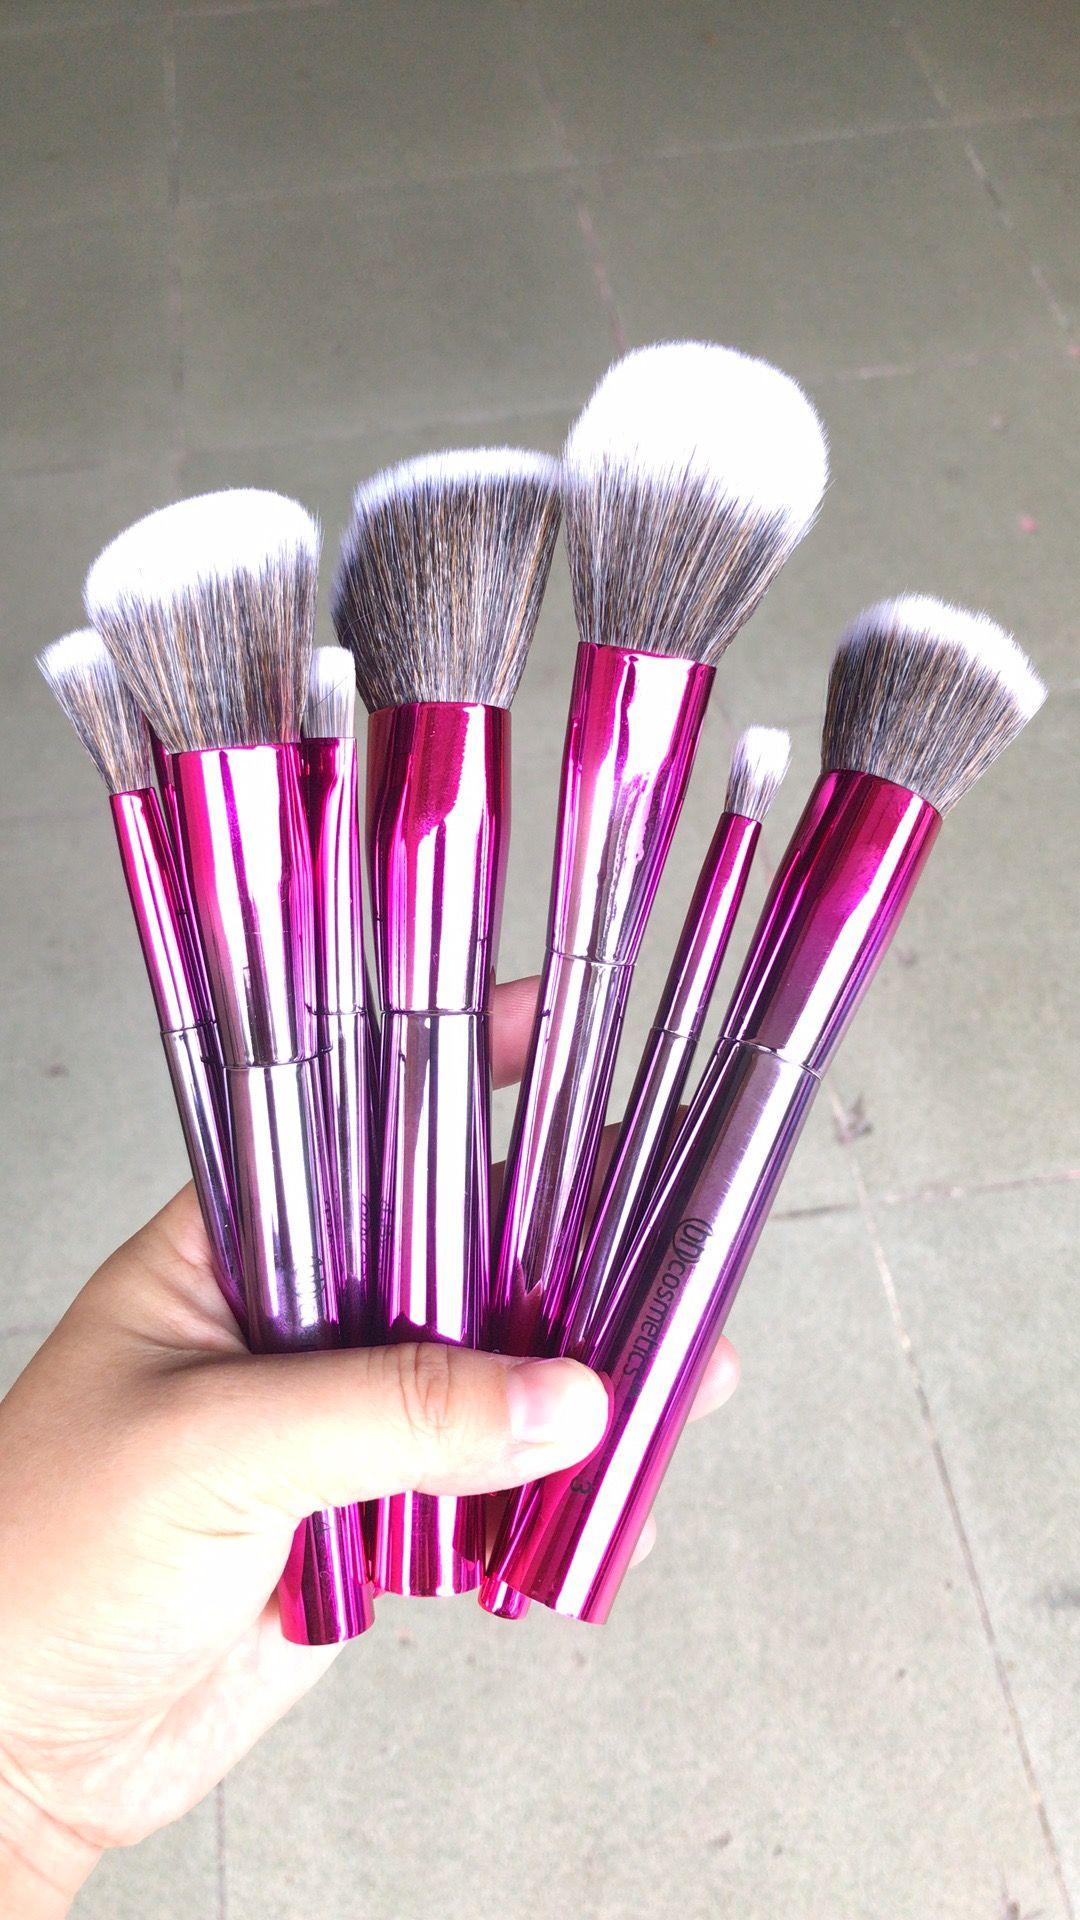 Royal Makeup Brushes Set Wholesale In 2020 Makeup Brushes Makeup Brush Set Brush Set